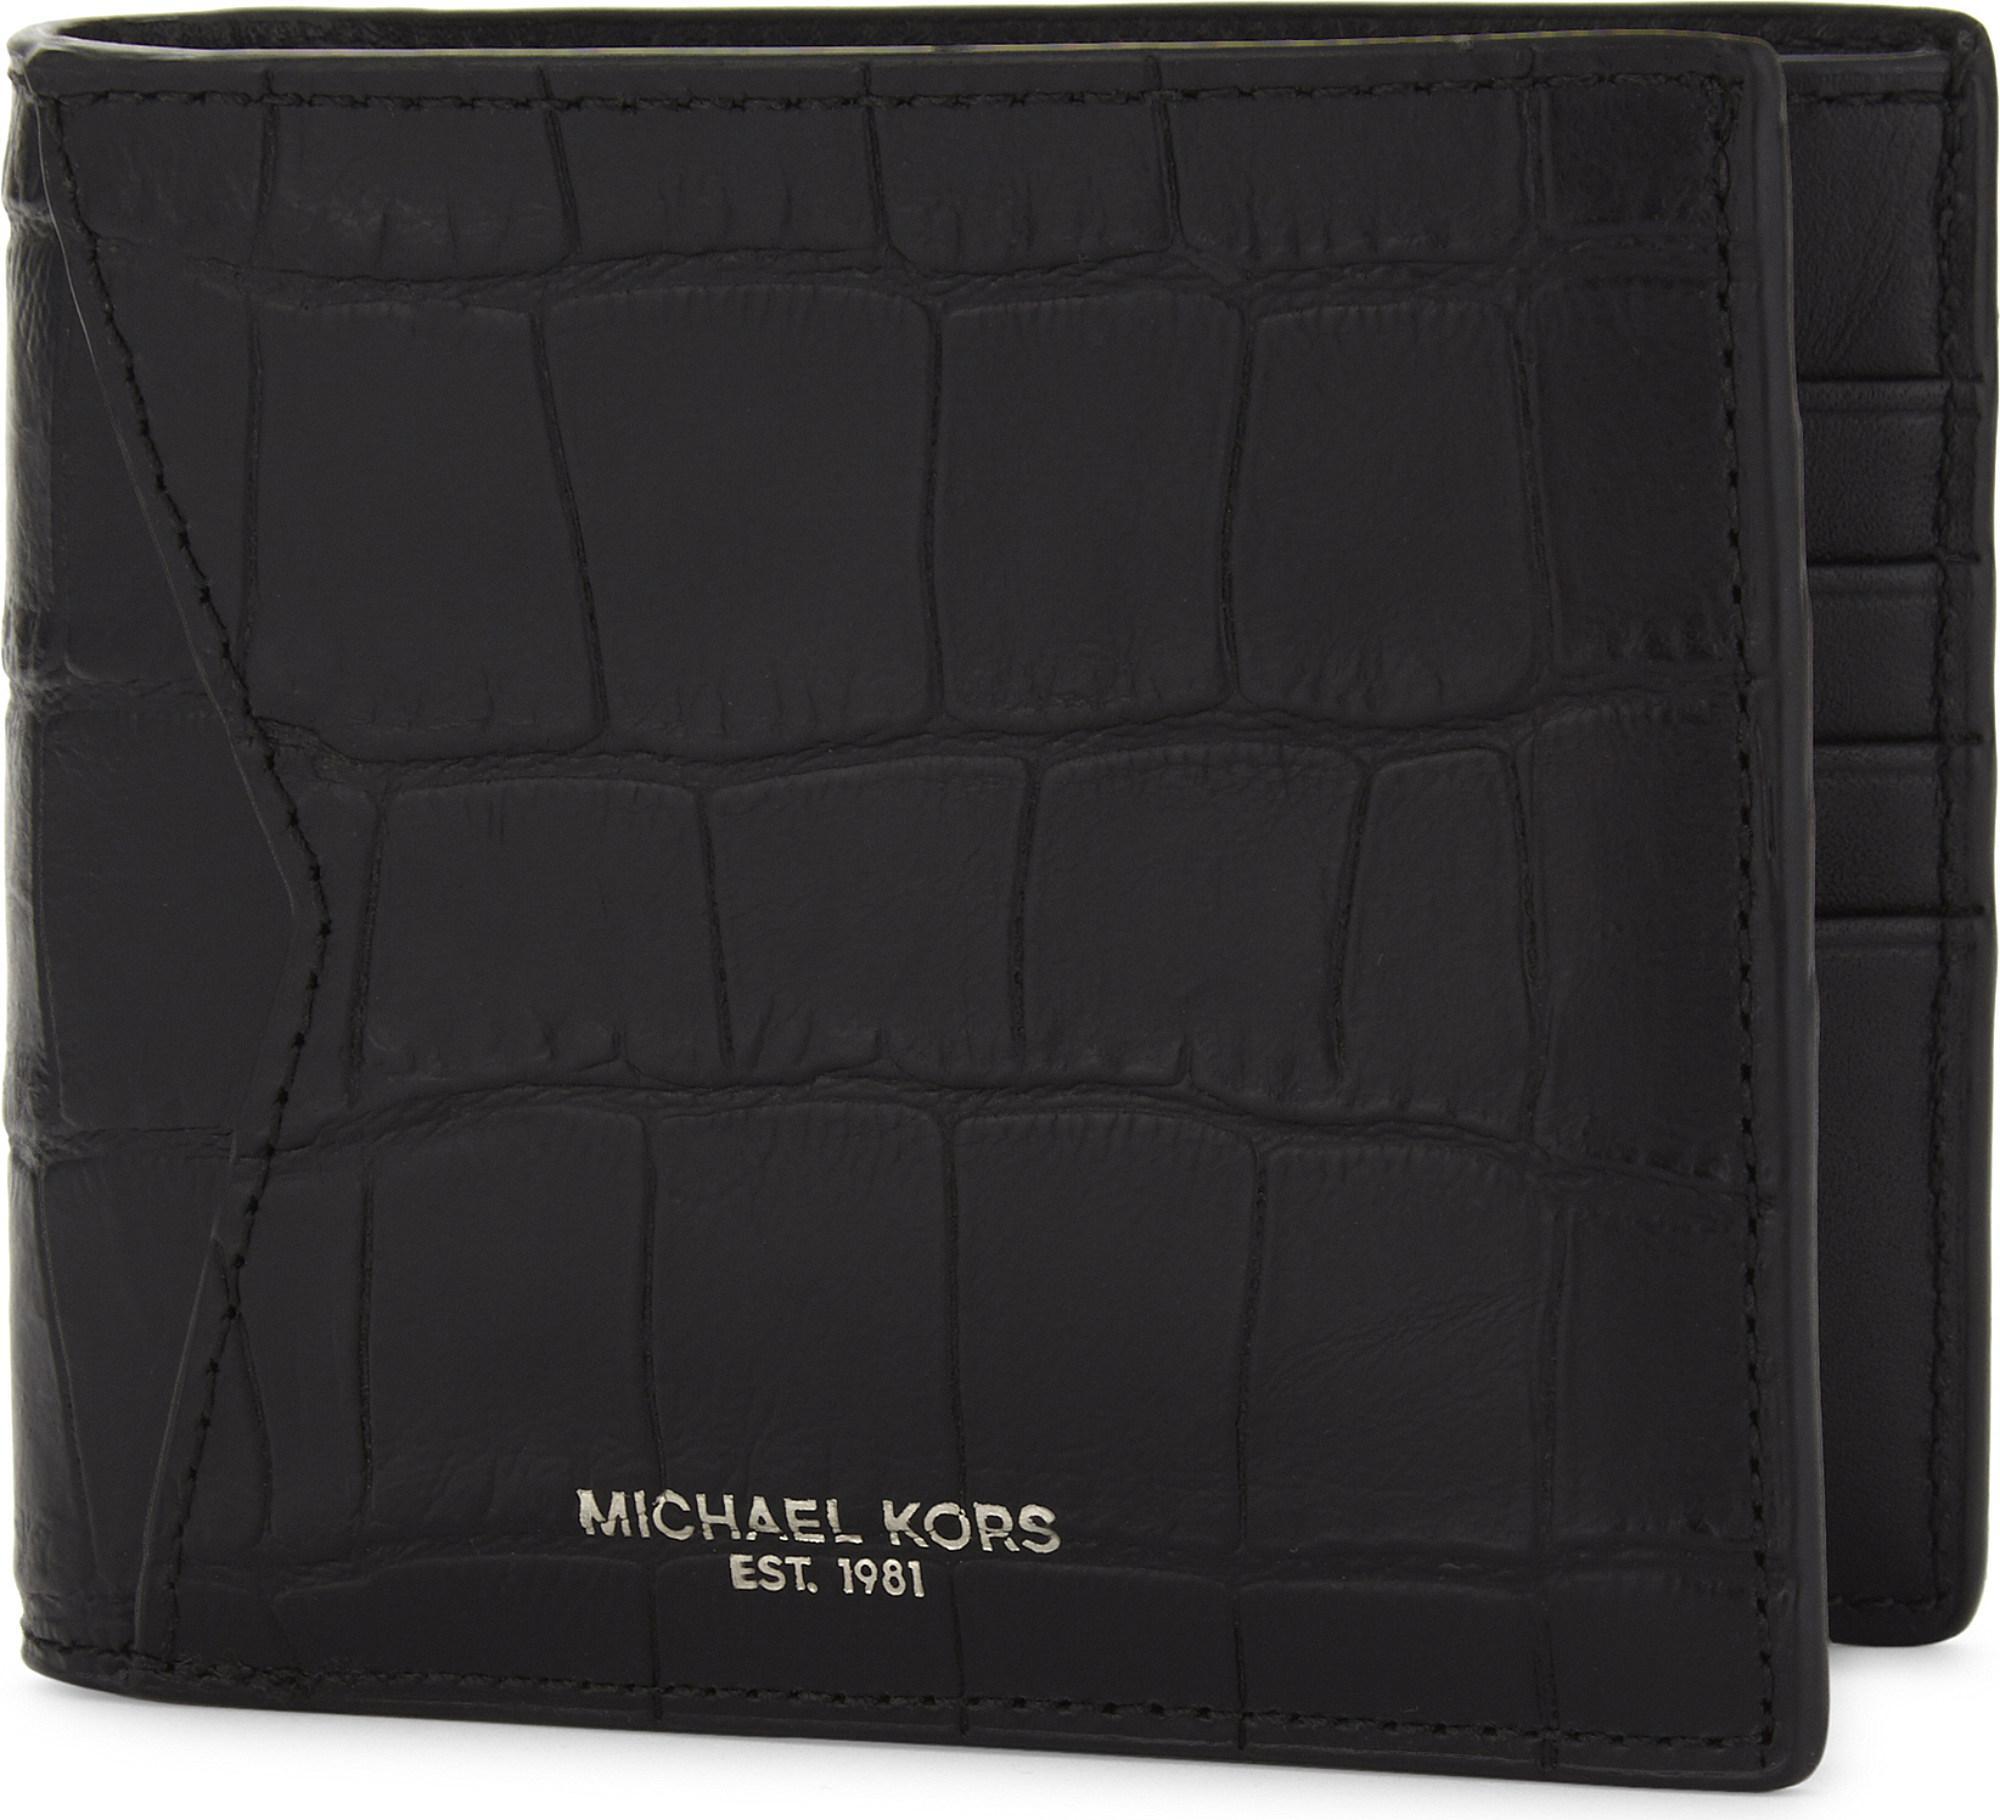 3d0b41465bb46 Lyst - Michael Kors Bryant Billfold Leather Wallet in Black for Men